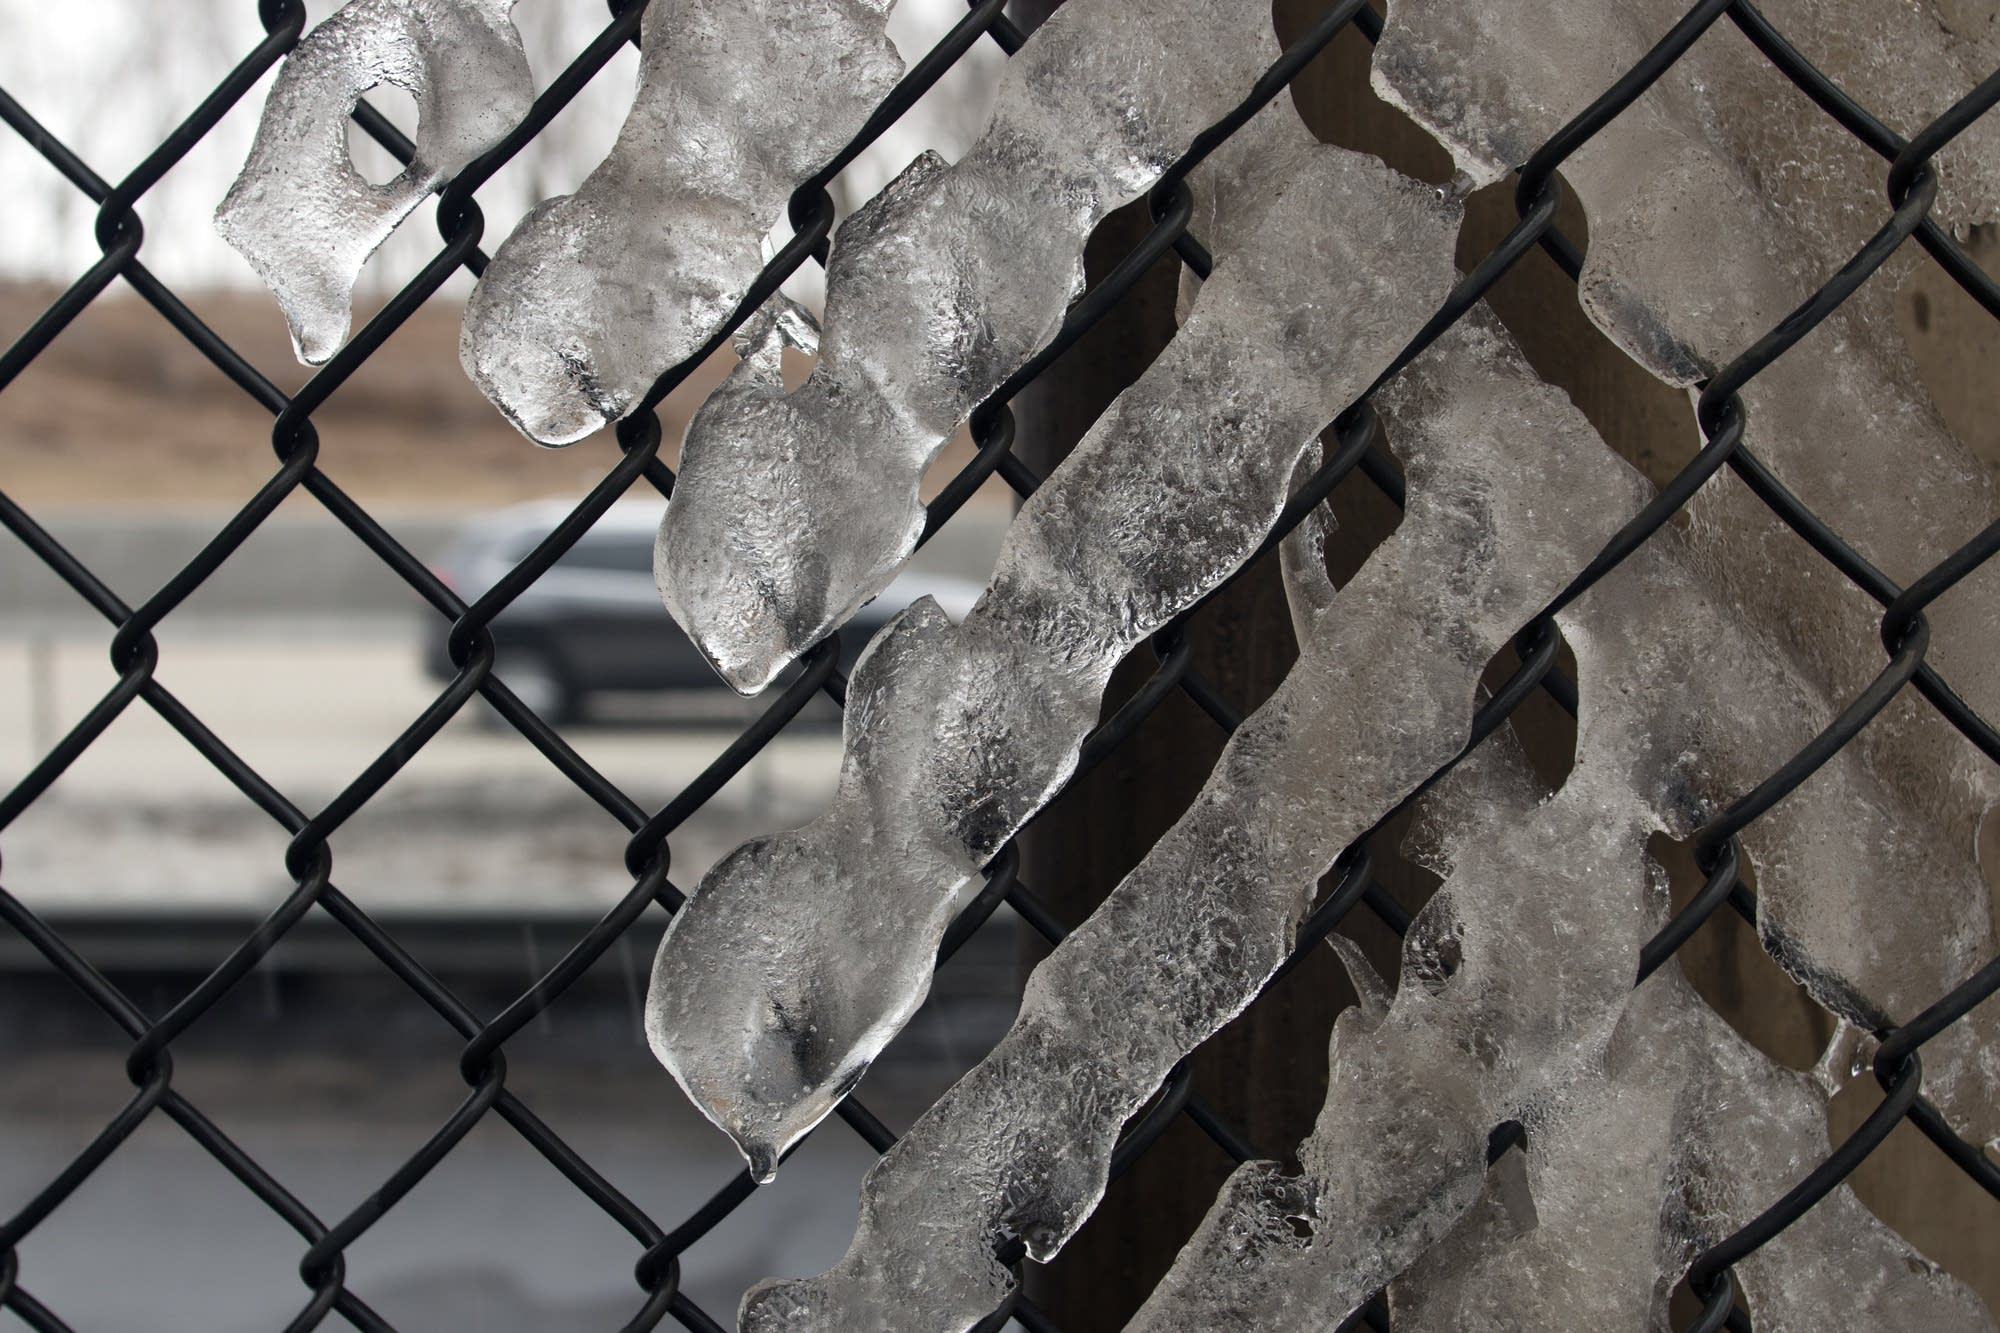 Ice melts in strange patterns alongside 694.